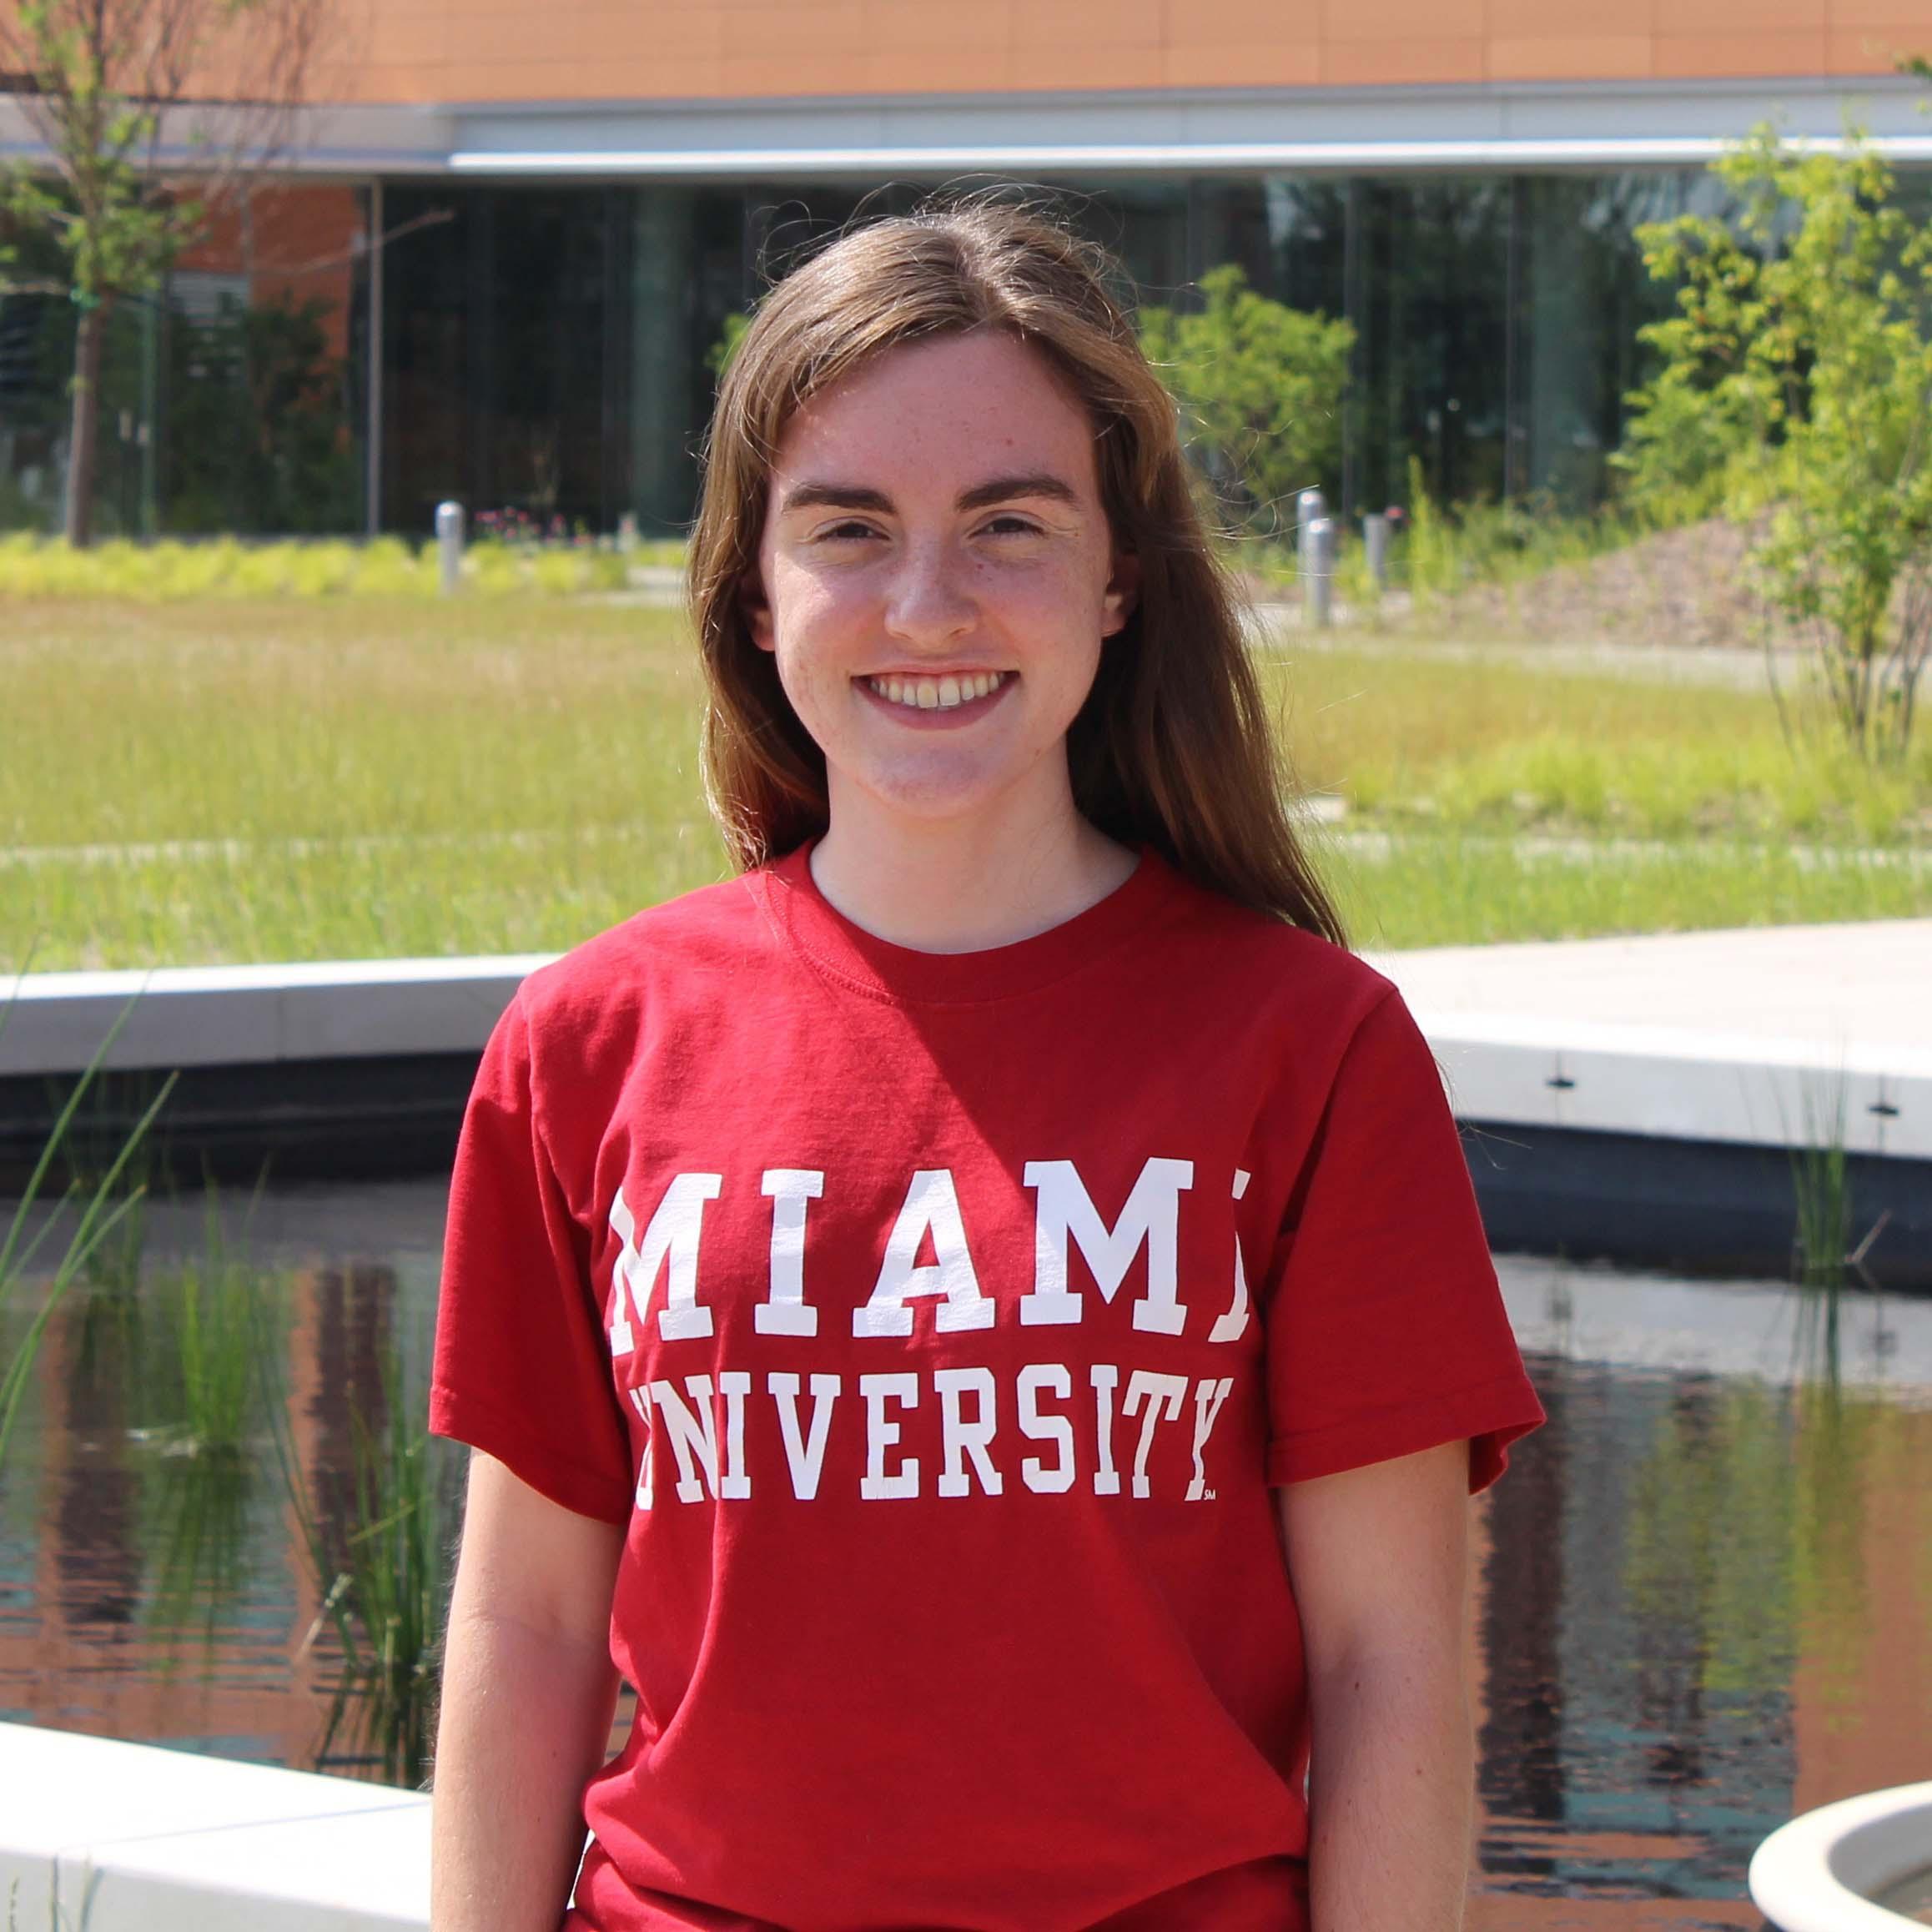 Rebekah Mohn, 2016 REU student